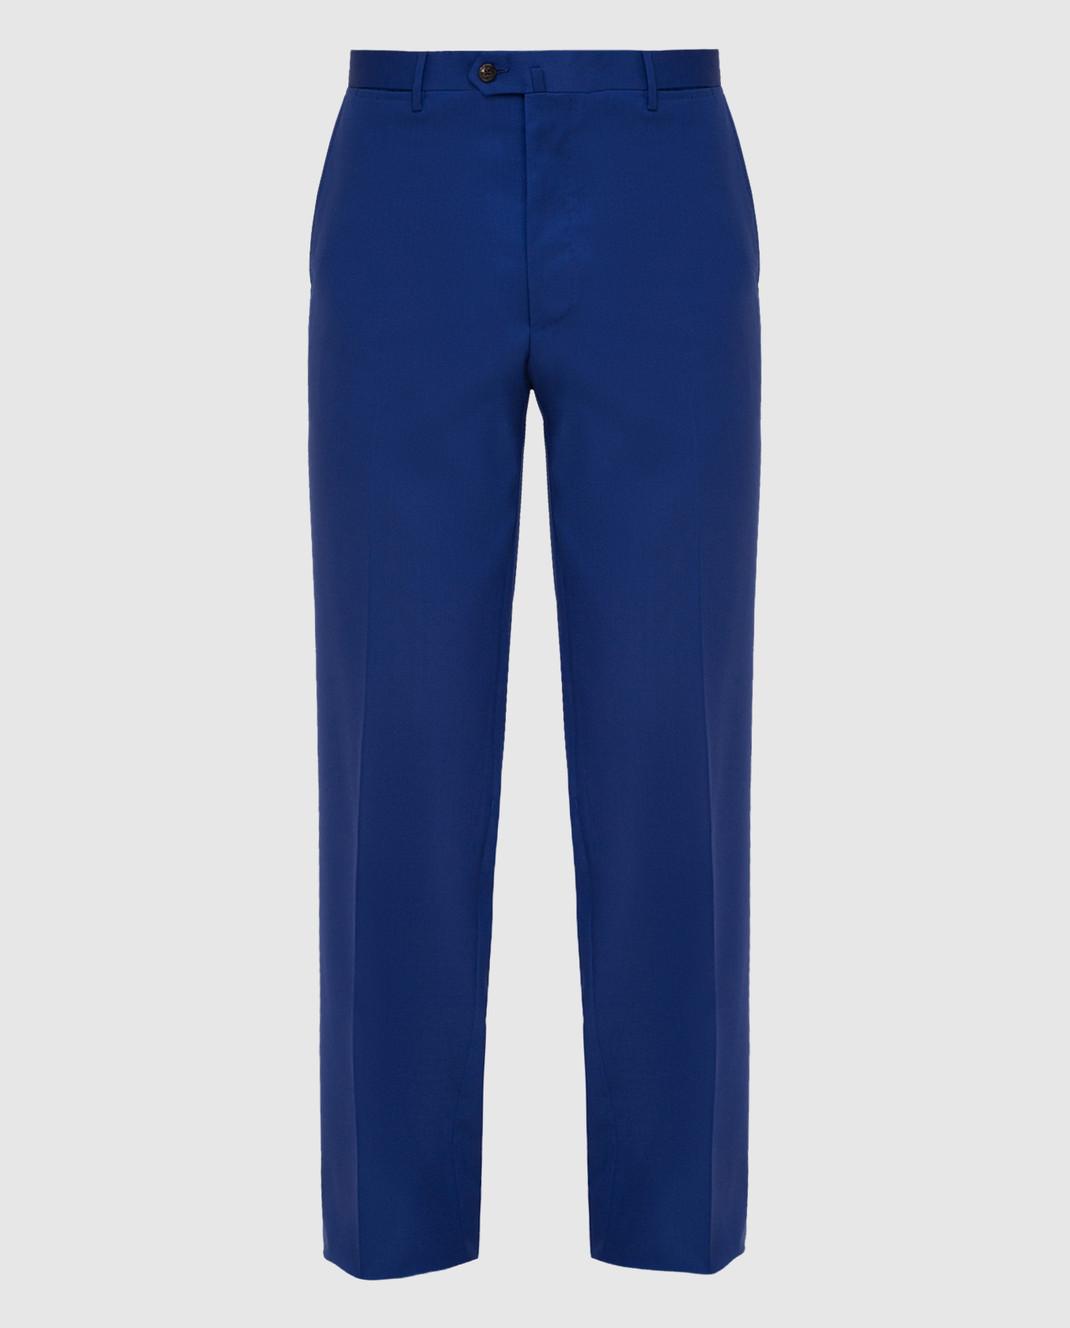 Castello d'Oro Синие брюки из шерсти изображение 1